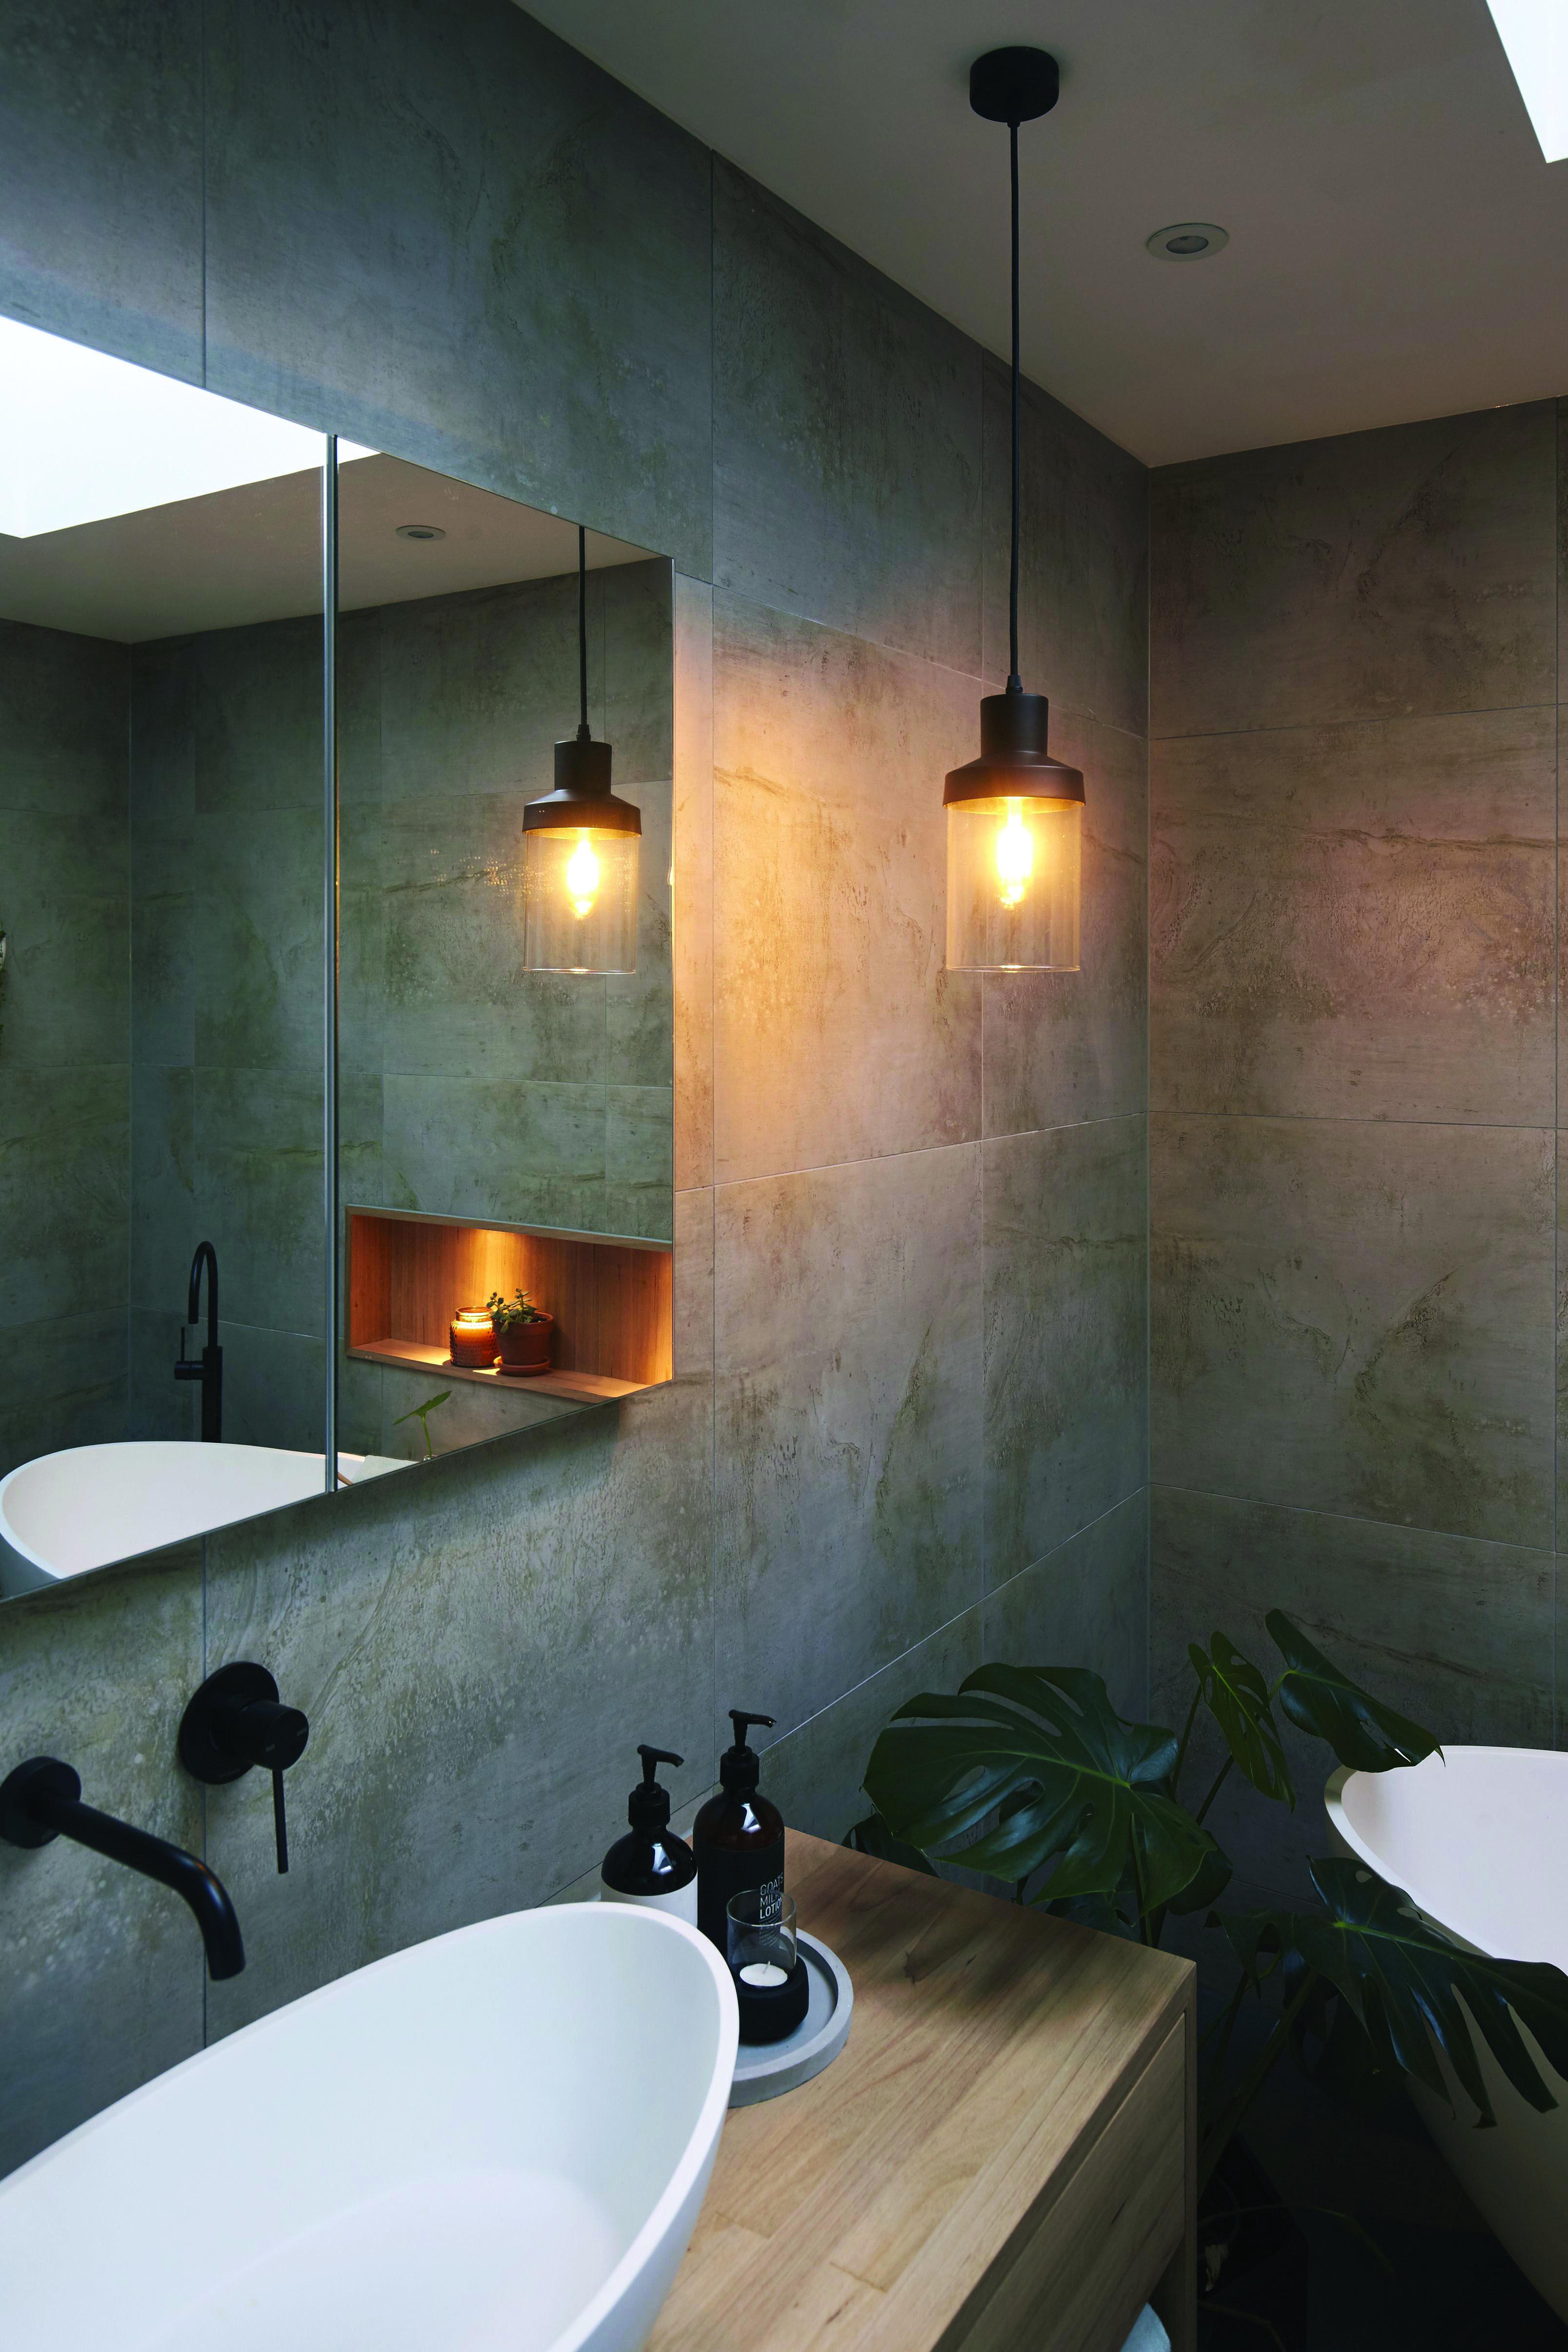 13 Dreamy Bathroom Lighting Ideas In 2019 Bathroom Lighting Ideas